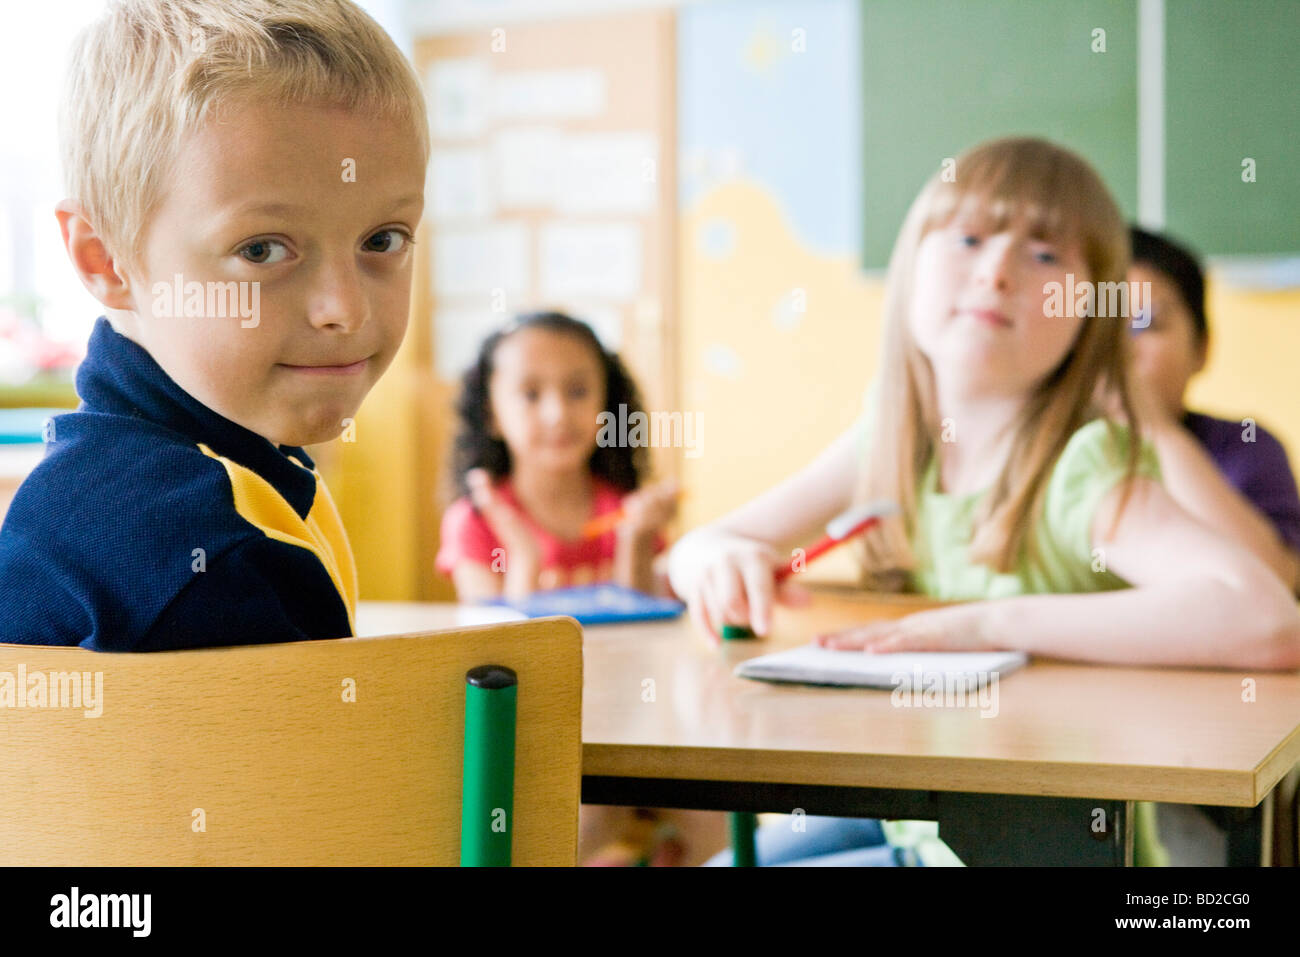 Children studying at school - Stock Image